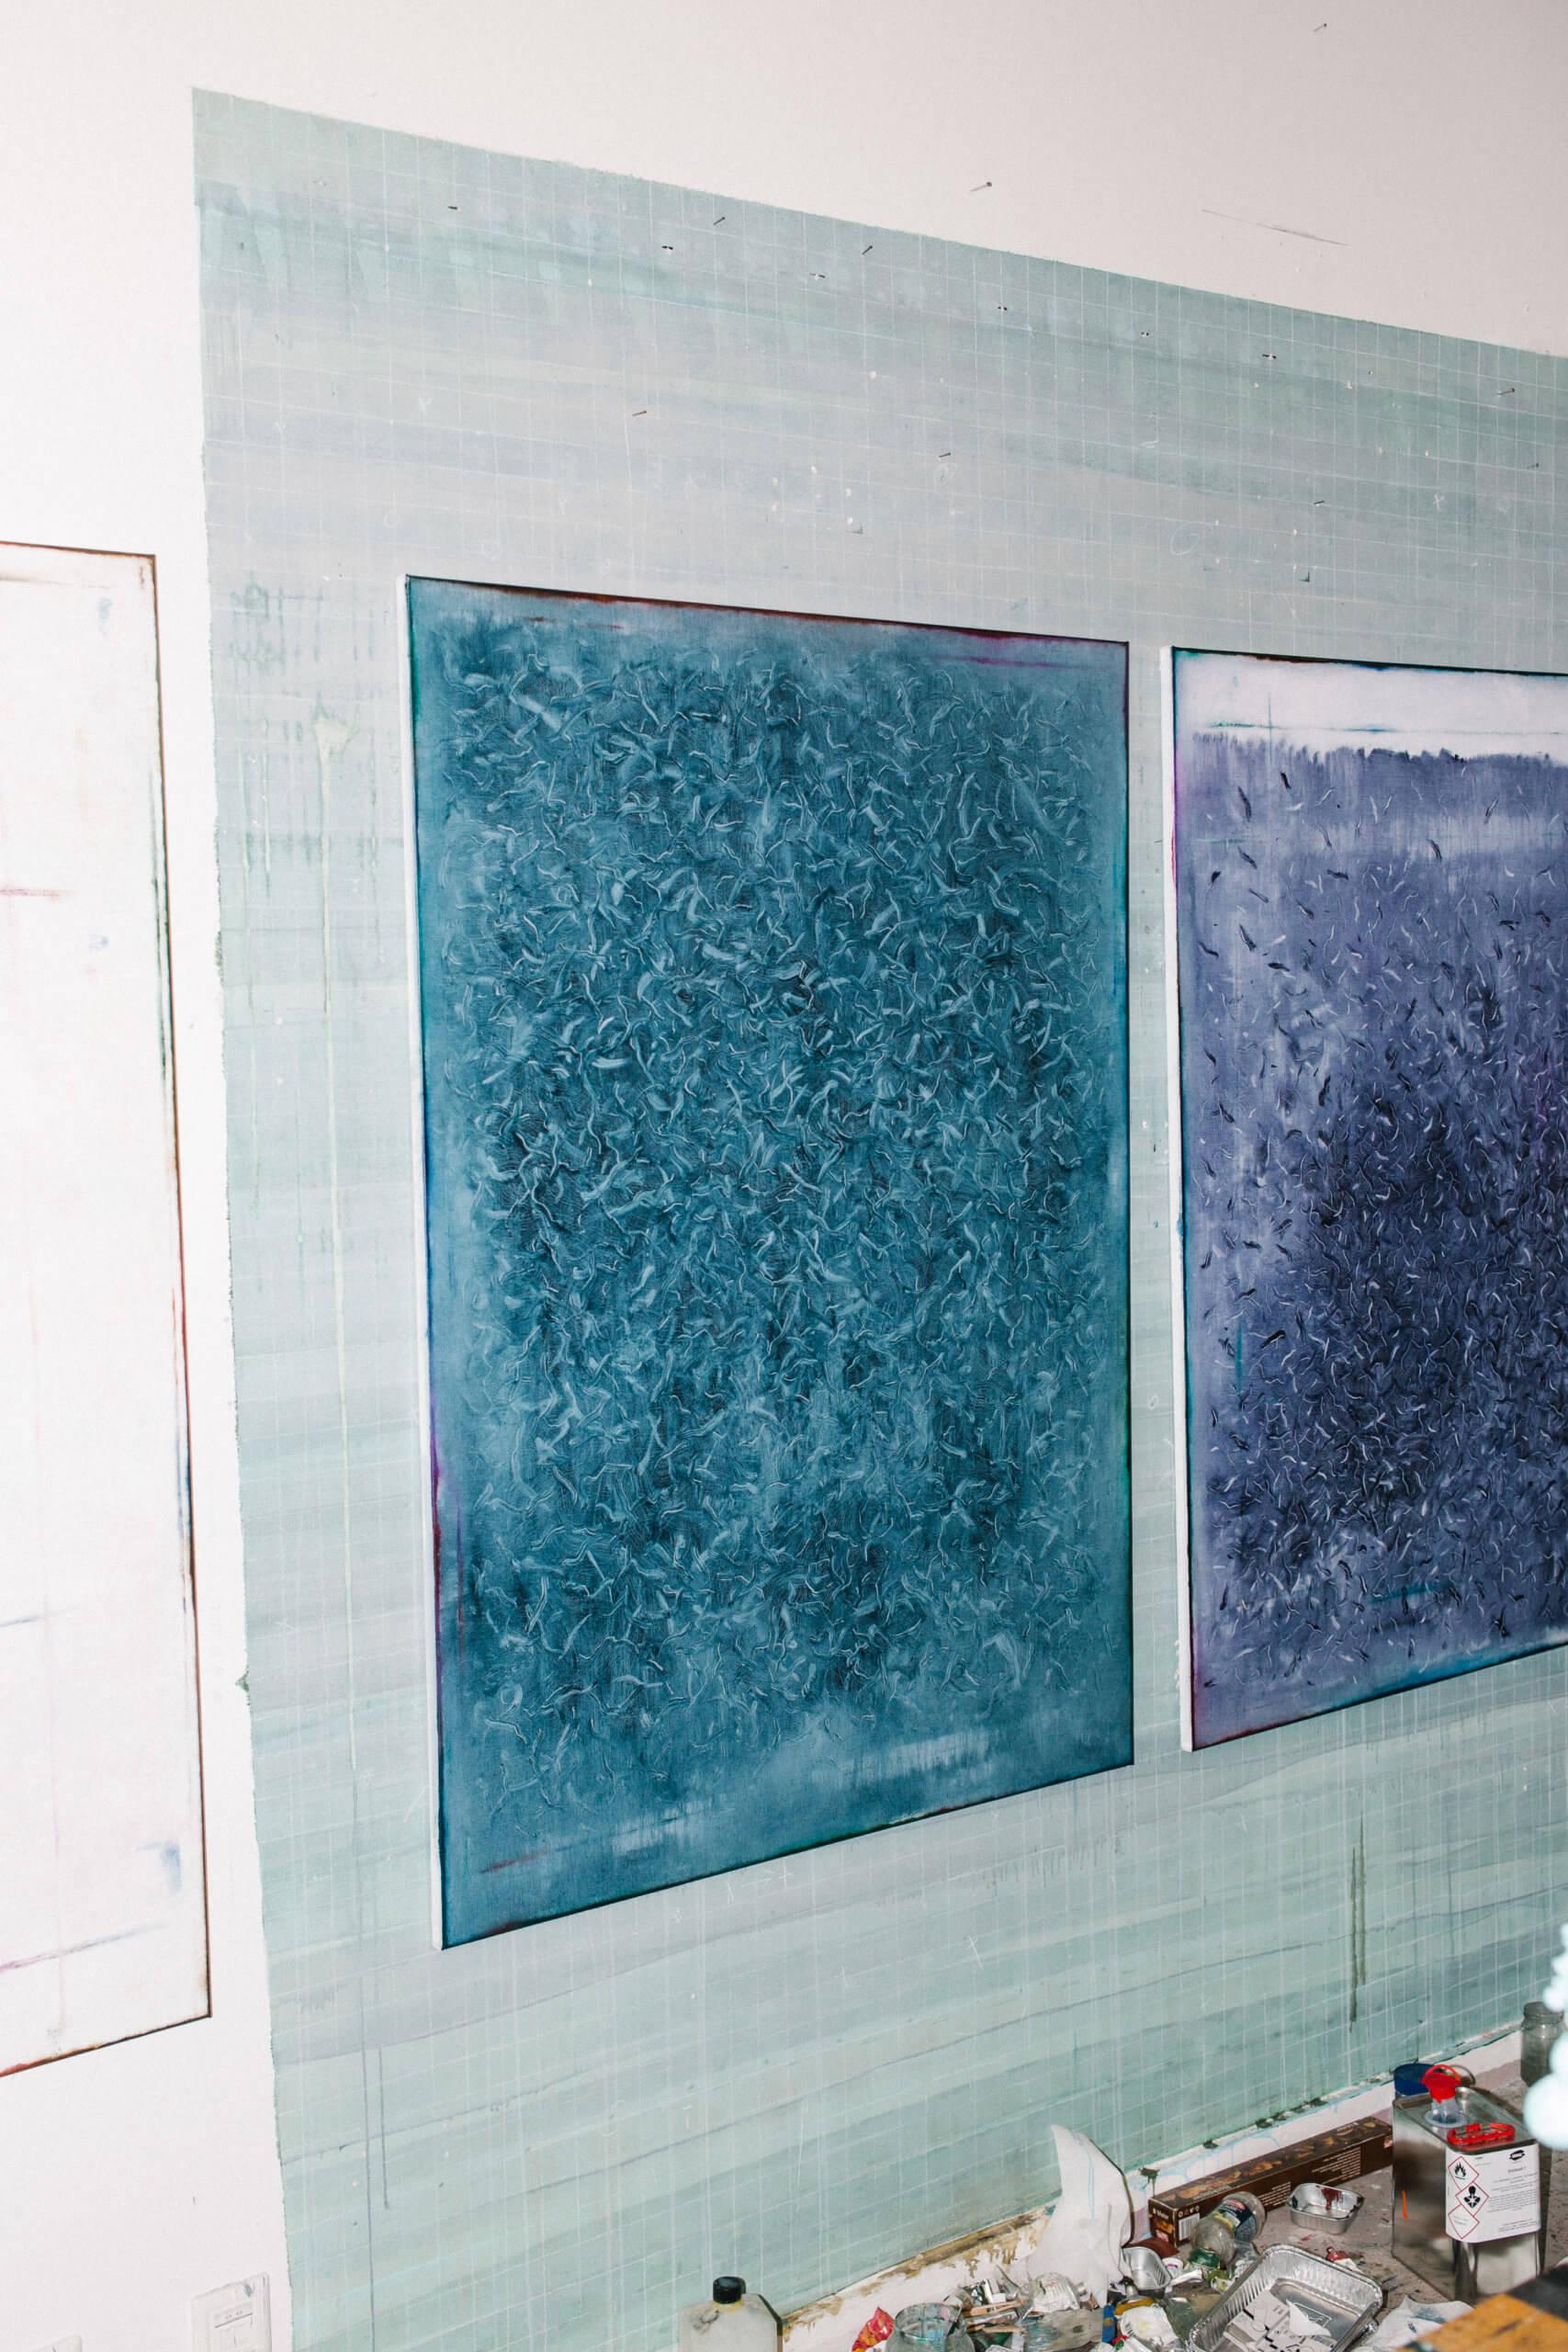 Unfertige Arbeiten von Duncan Swann hngen an der grünen Wand.